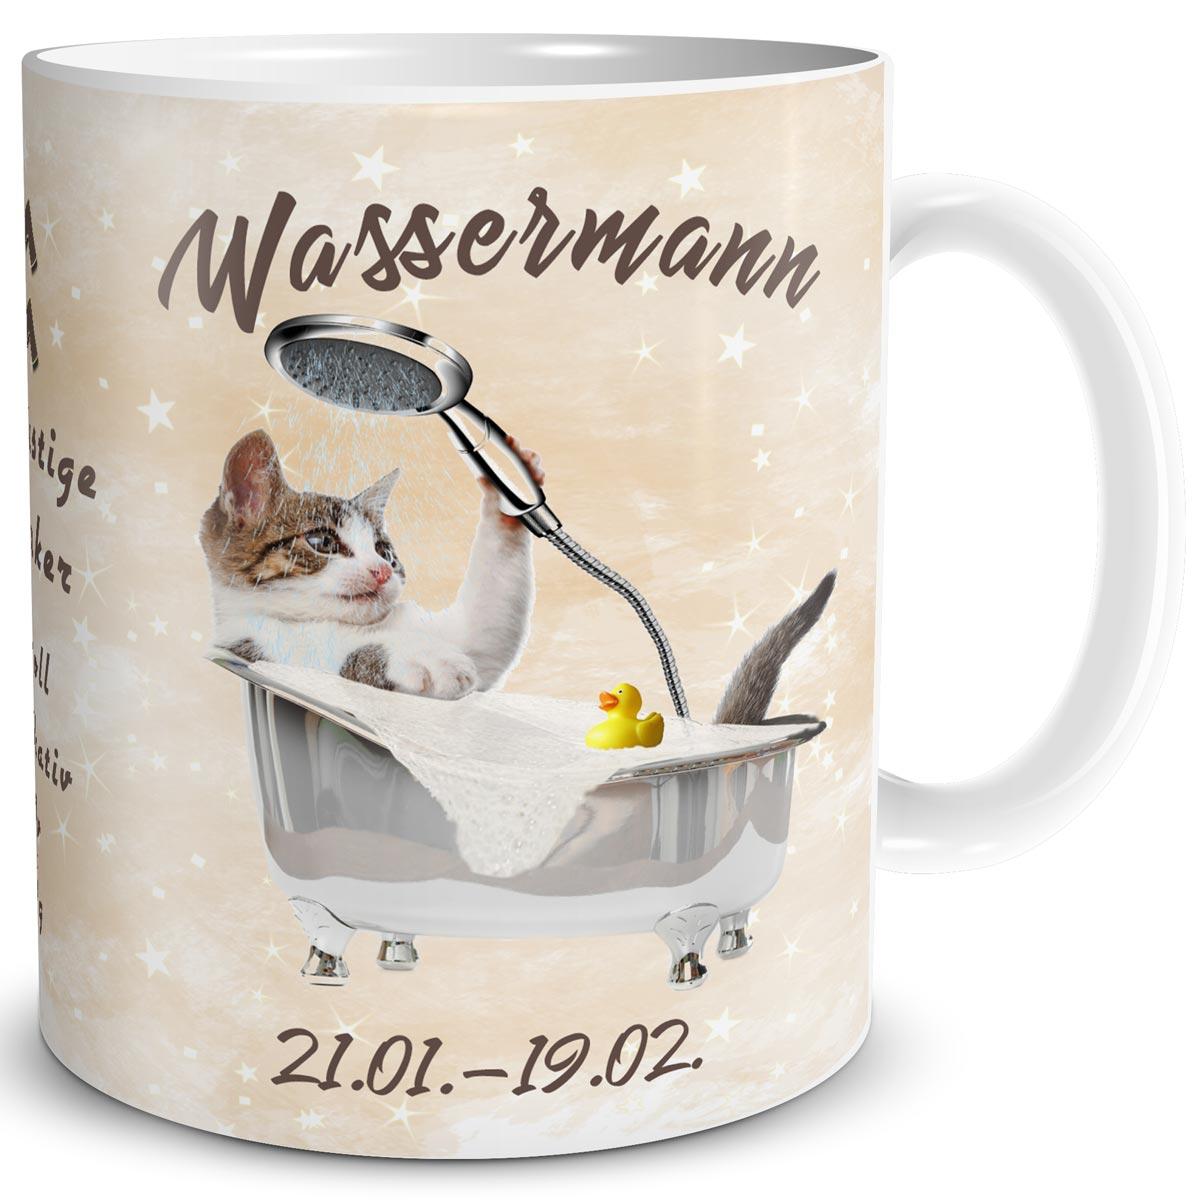 World of the Cat Dunoon Glencoe Porzellanbecher Welt der Katze Katzen